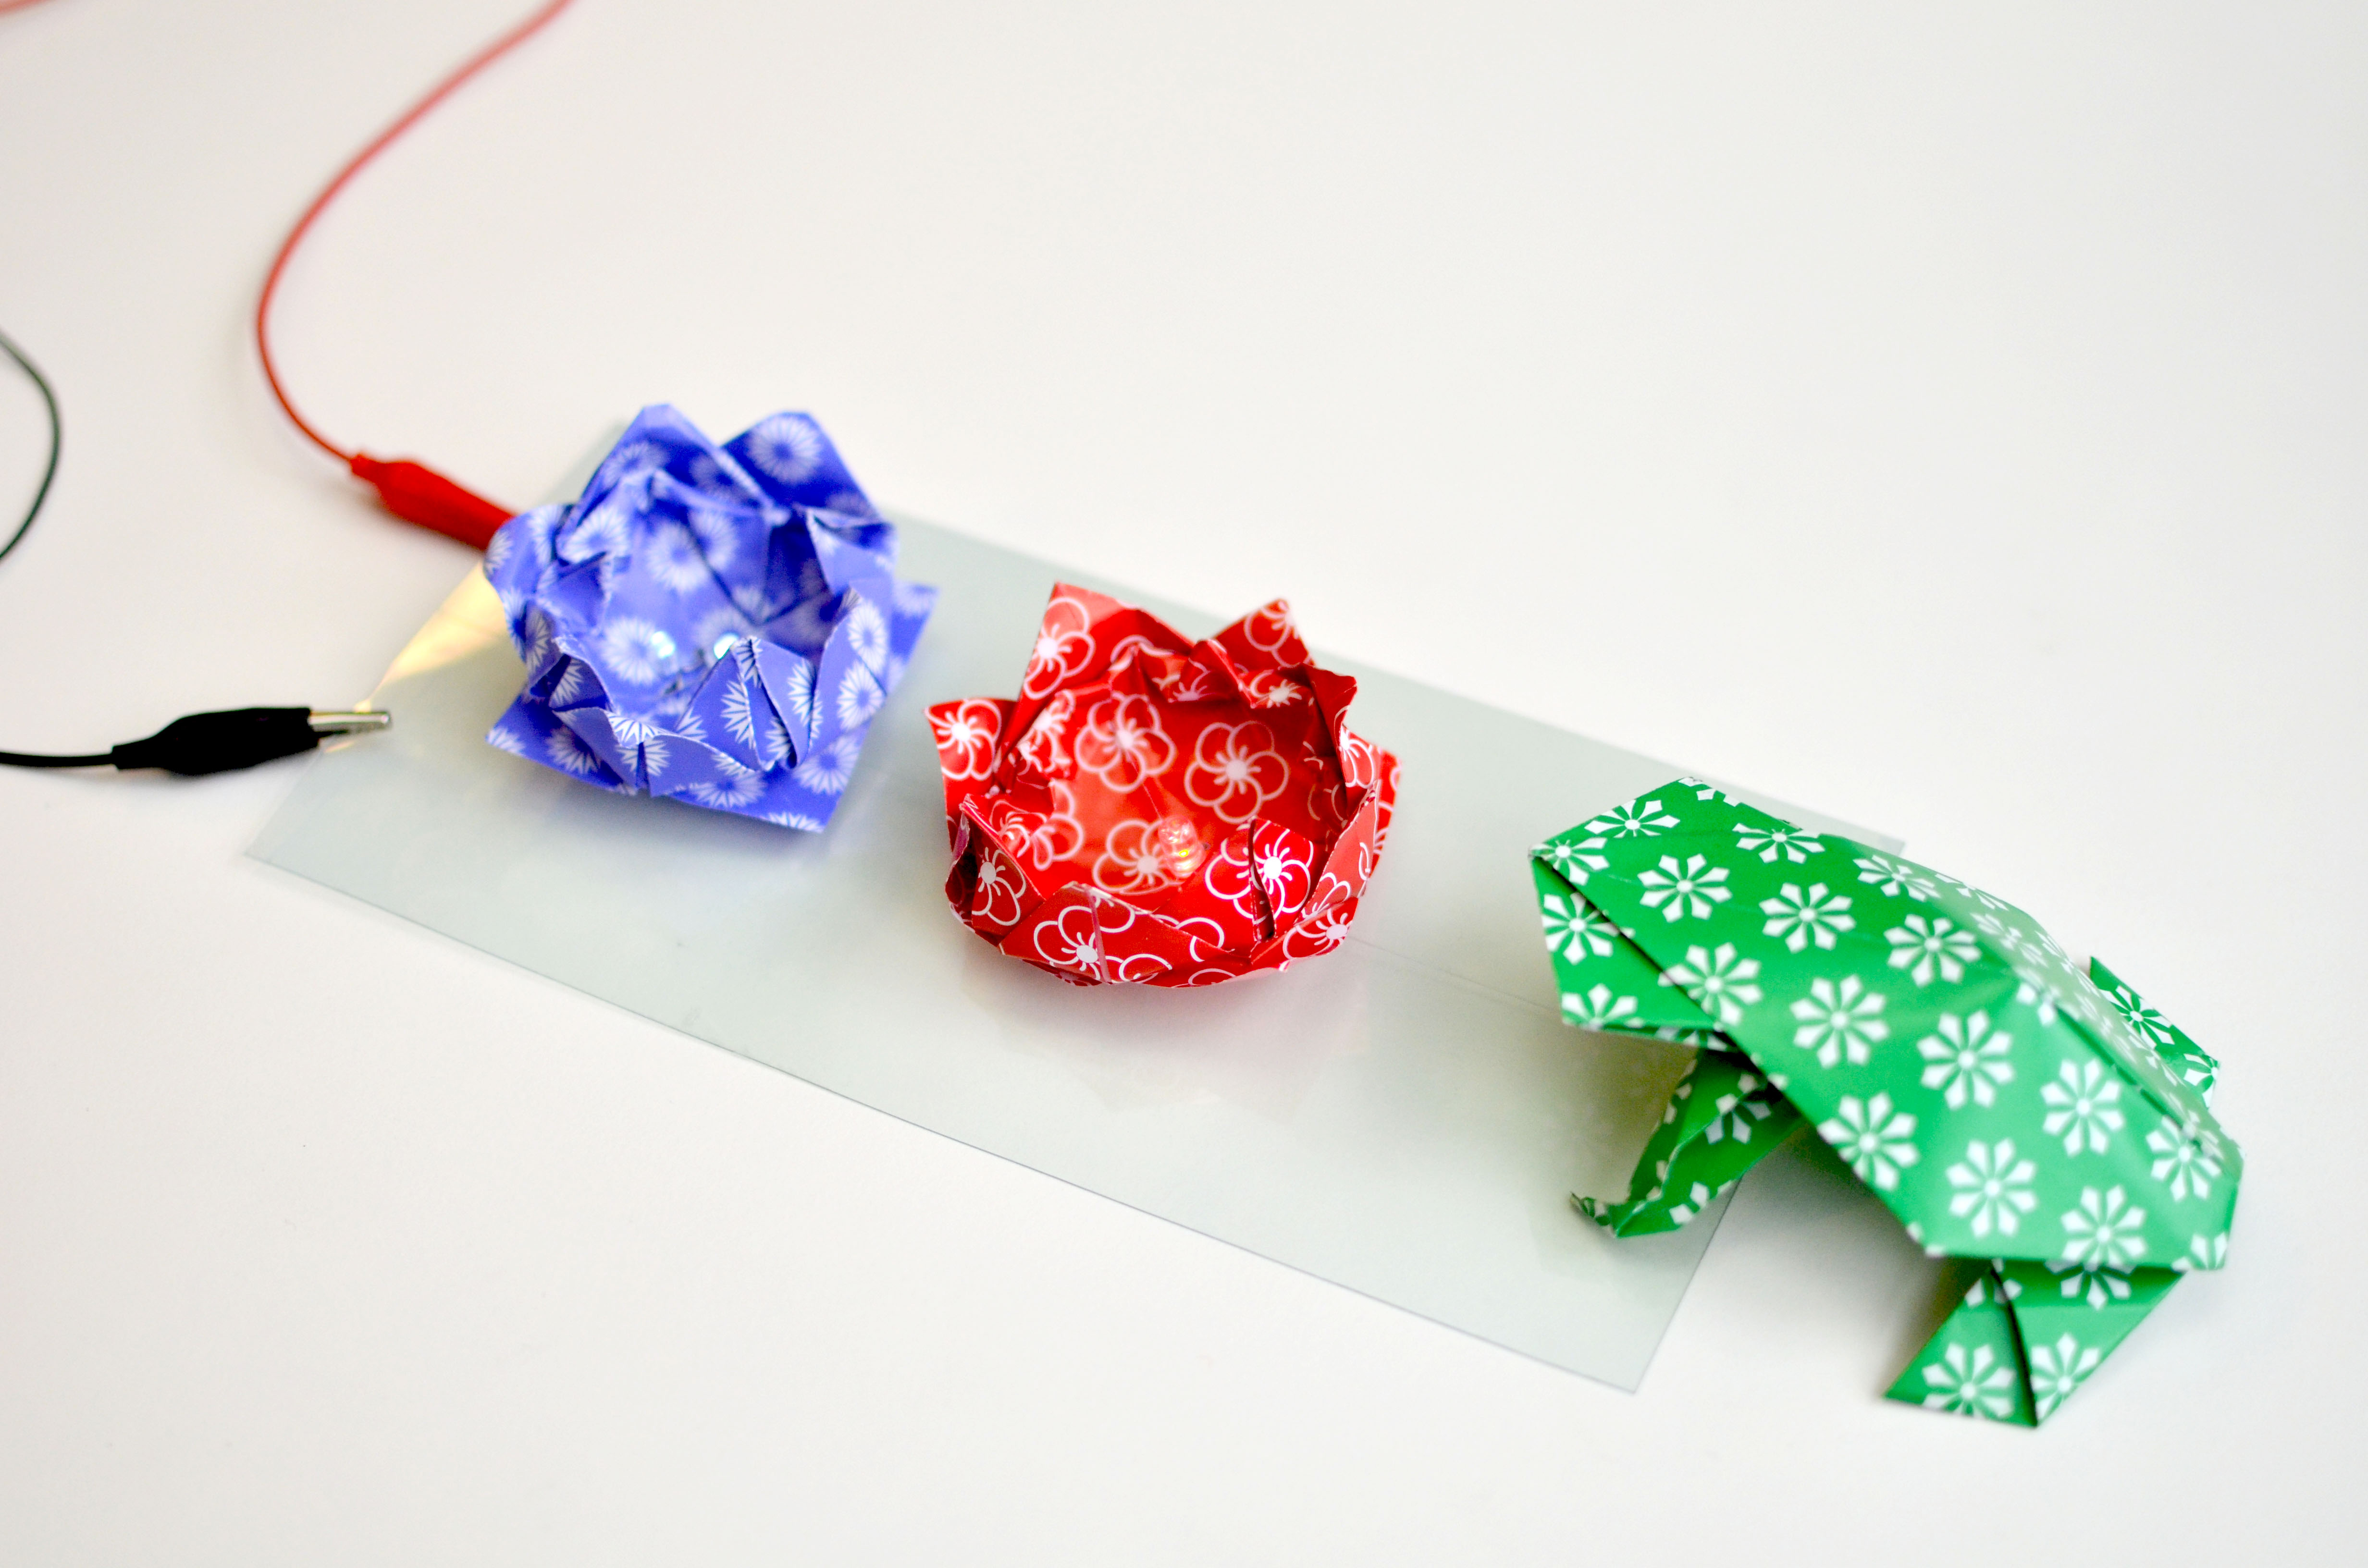 braincrafts_LED_ITO_Origami_pond_arrangement.jpg